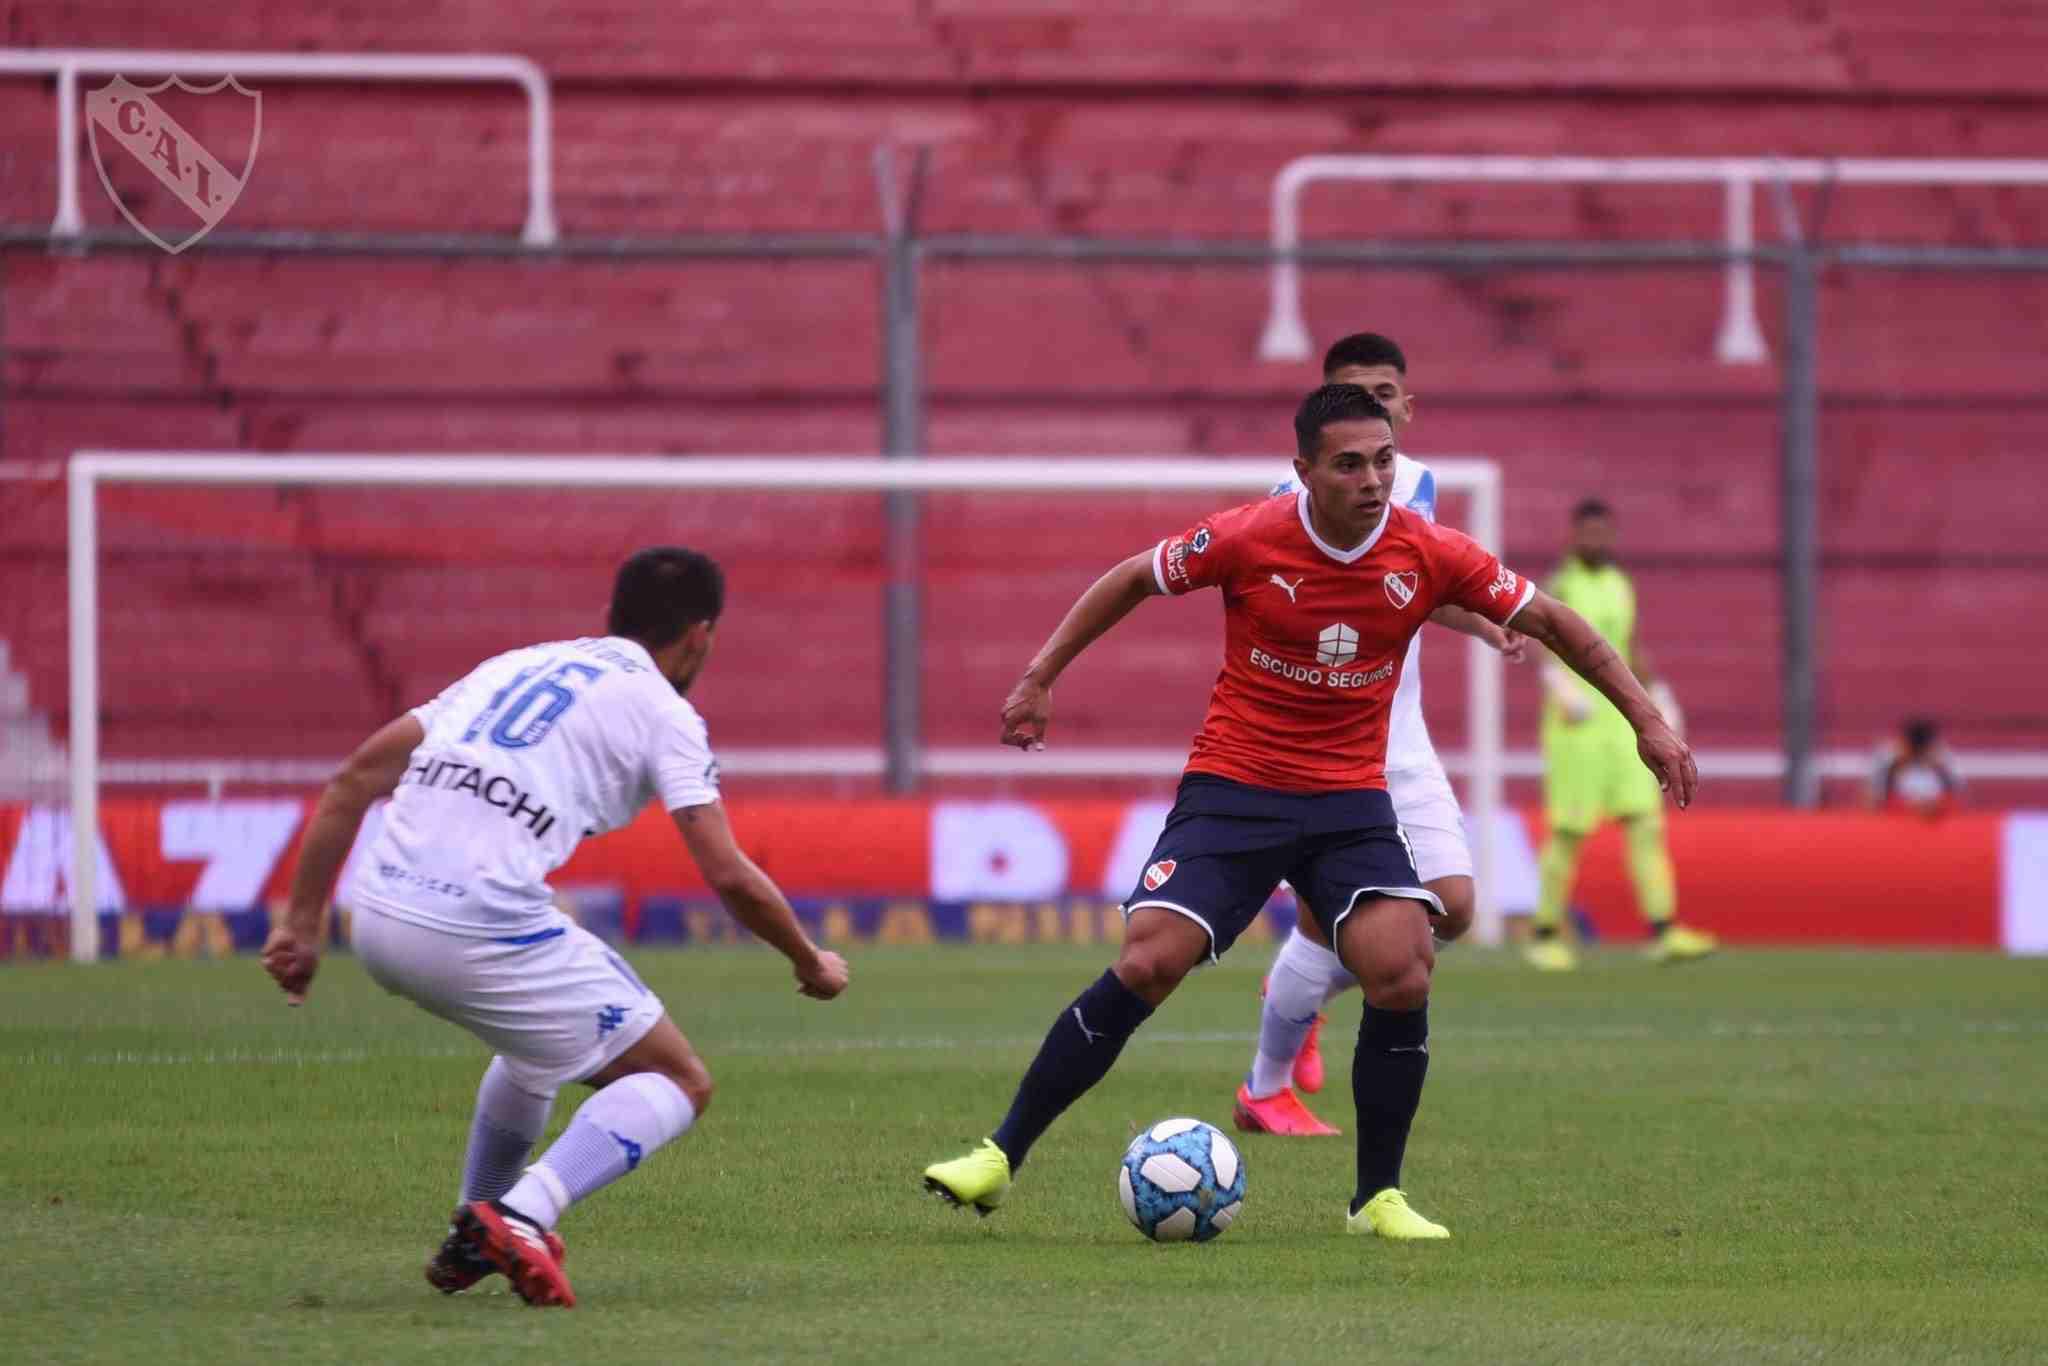 Lucas González Independiente